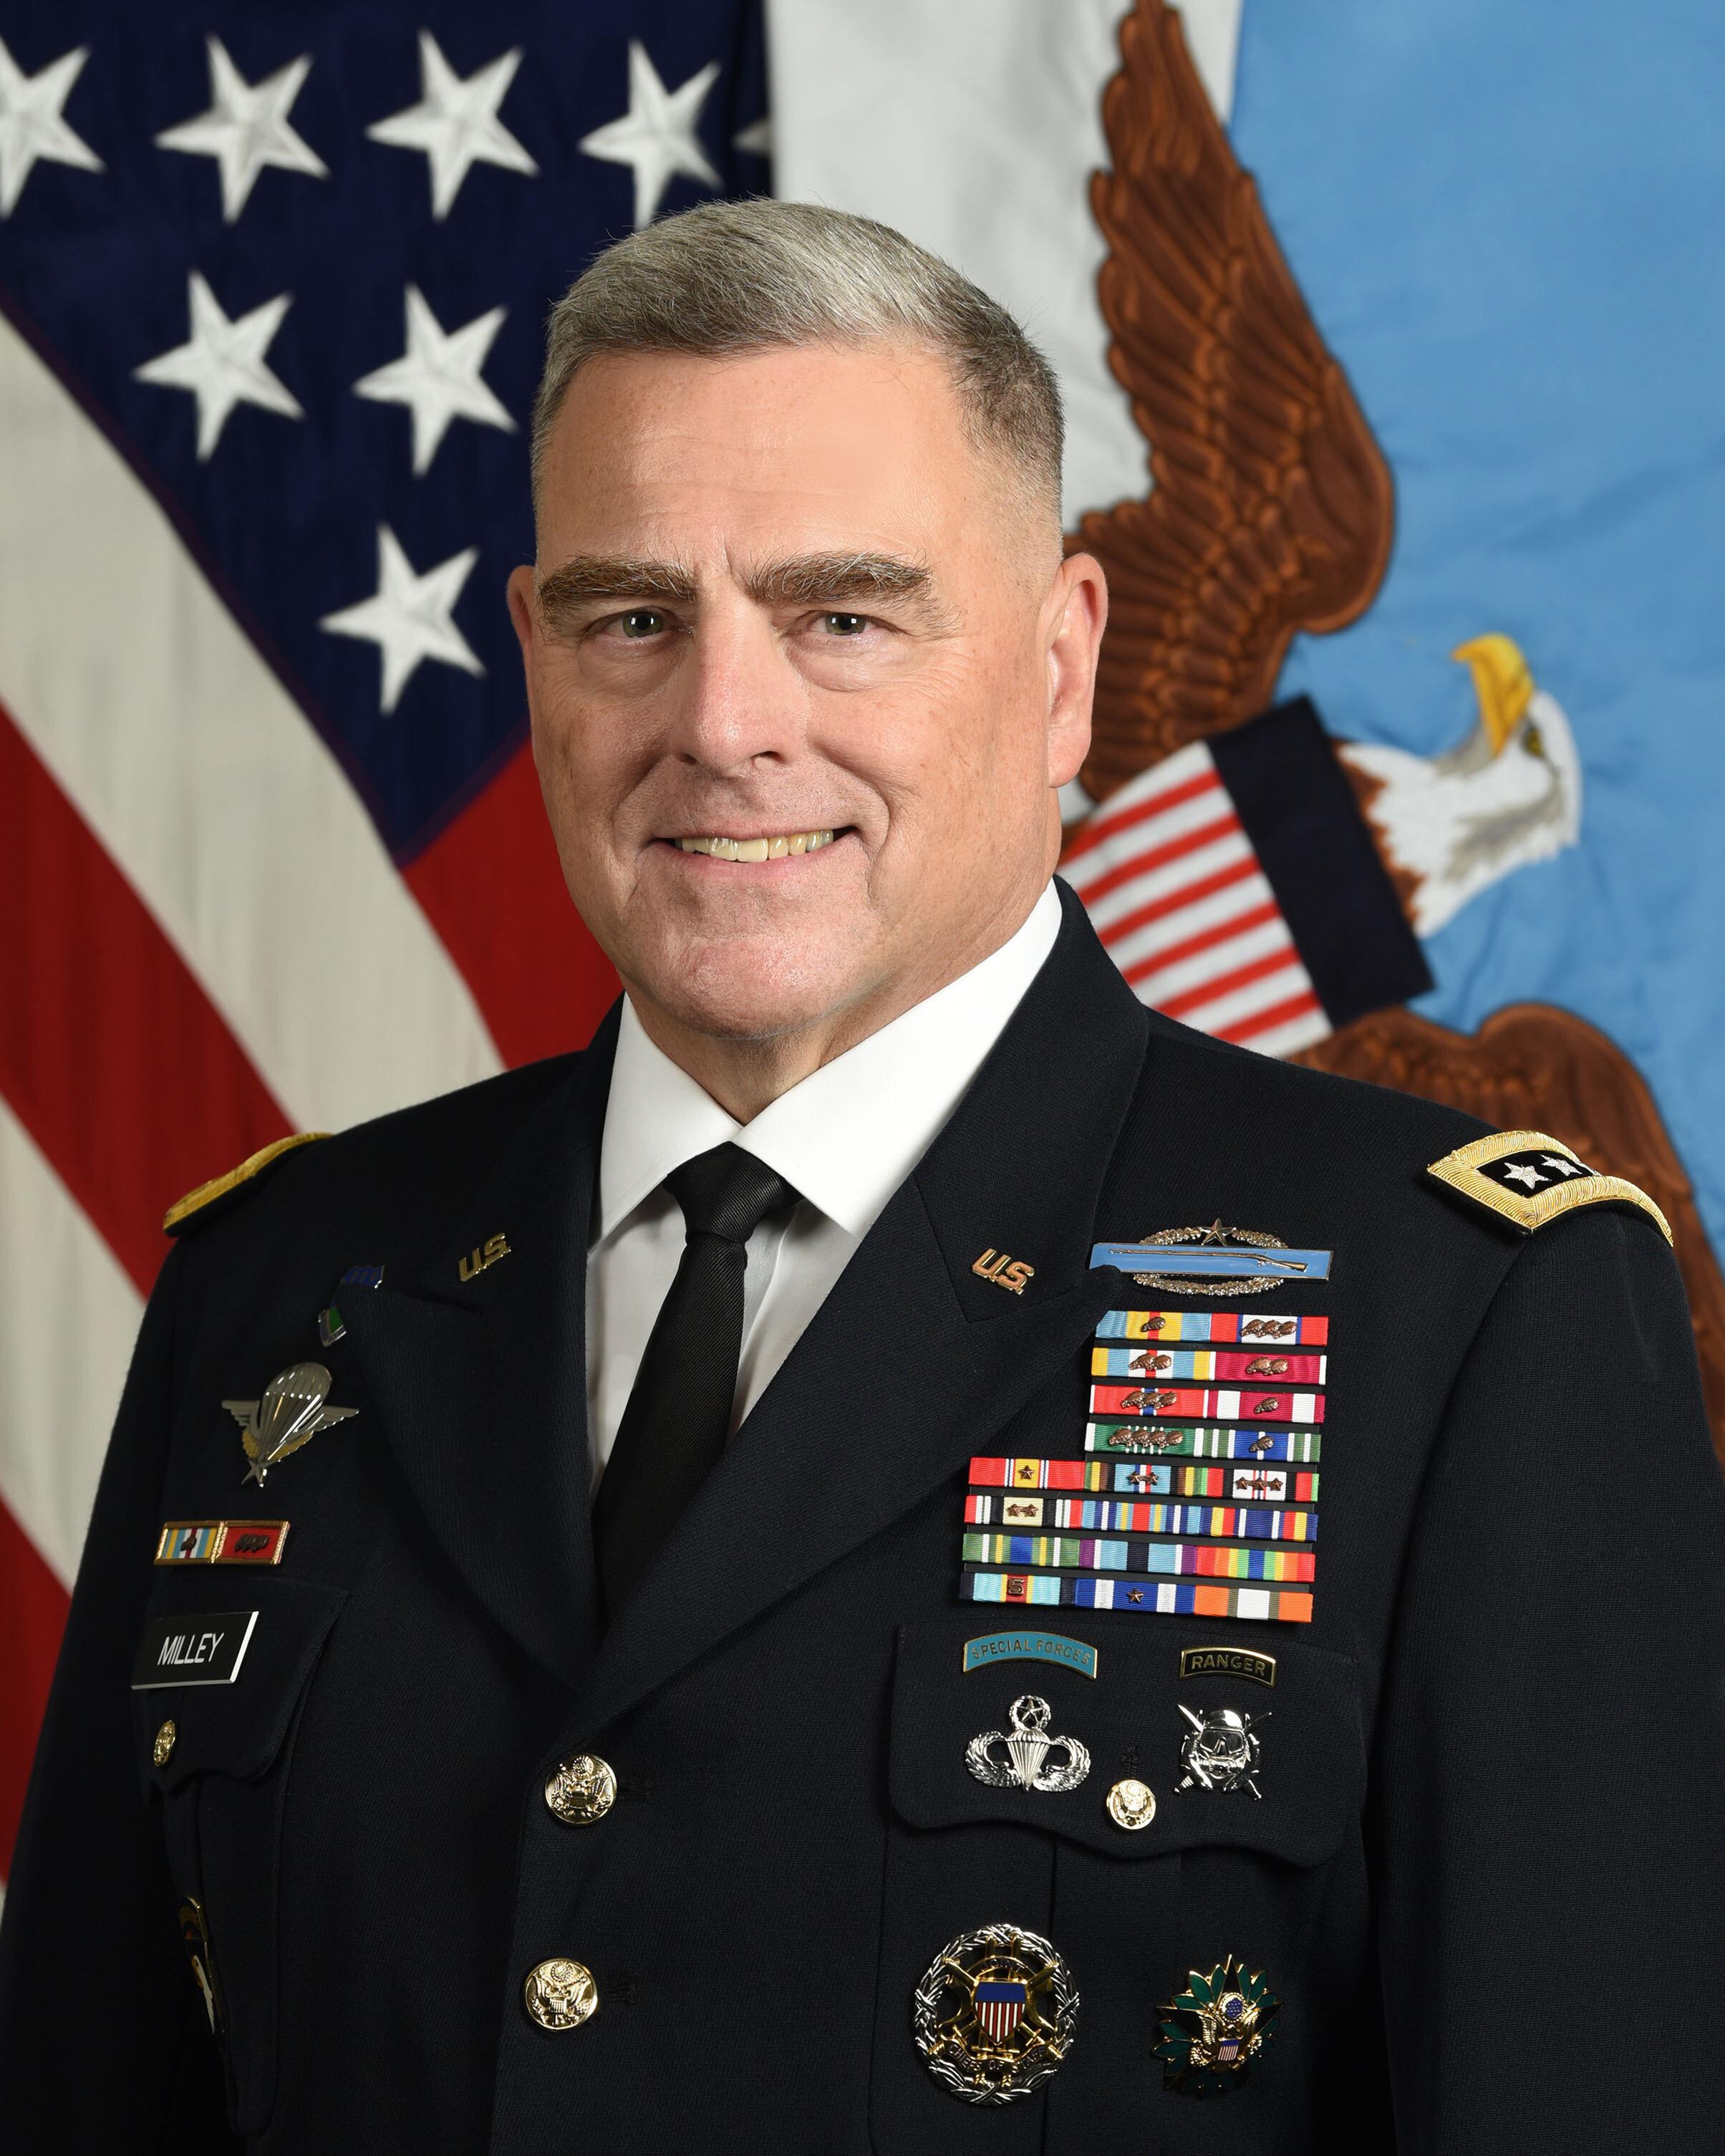 Amiral Cahrles Ray